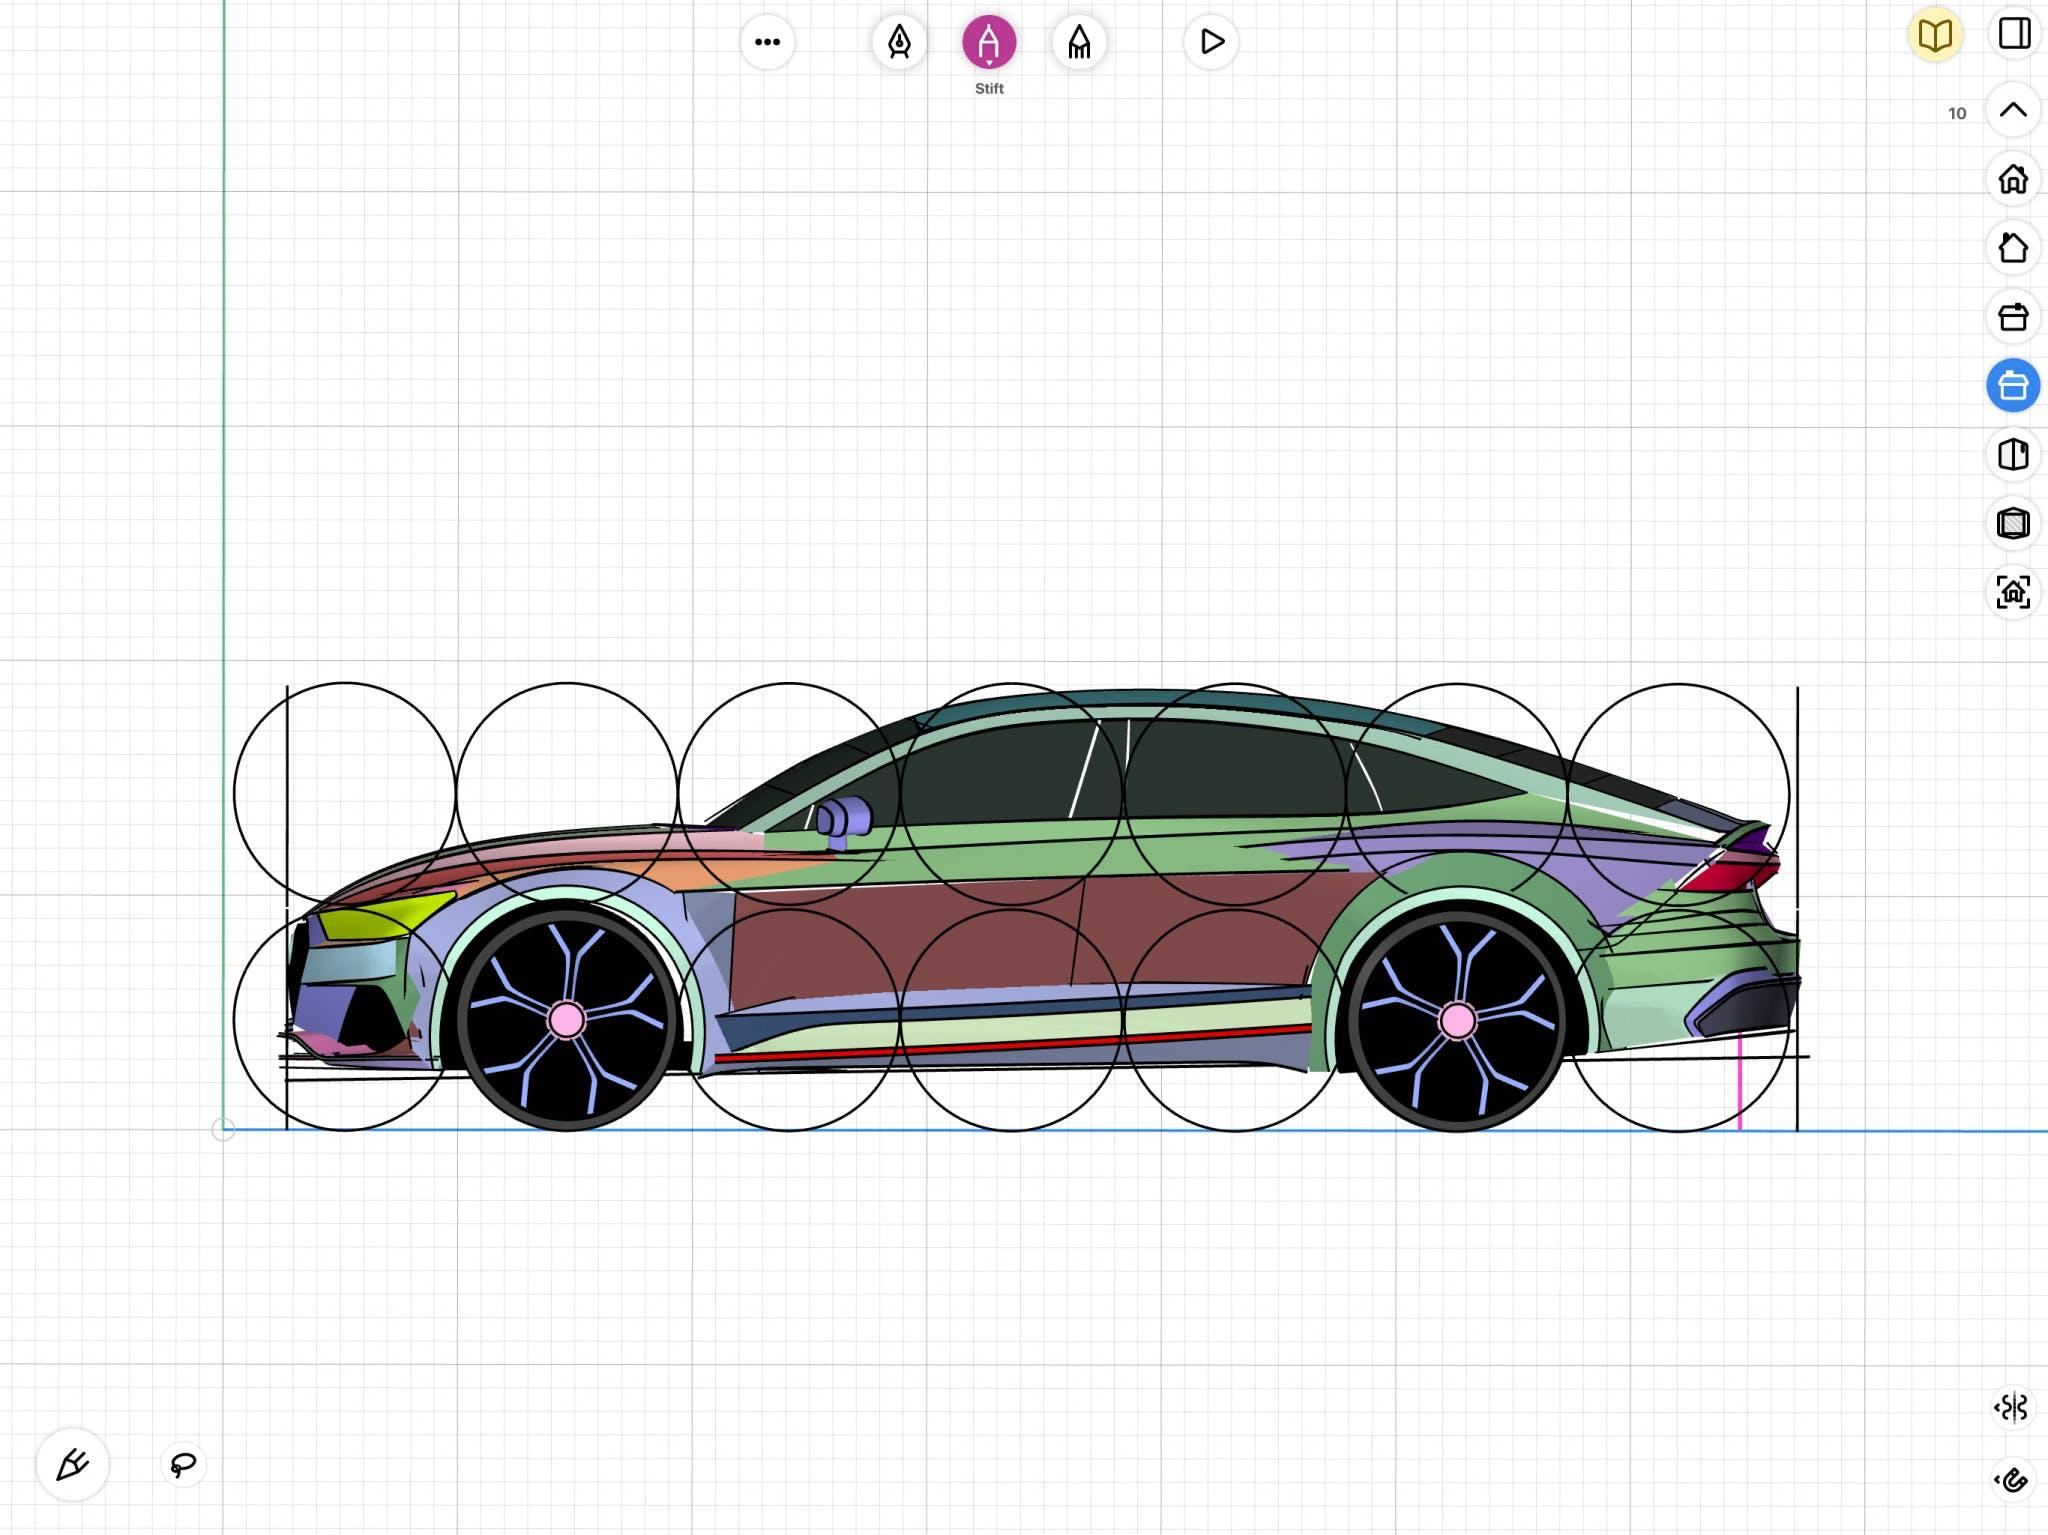 Aleksander Dietrich - Automotive Drawing in uMake